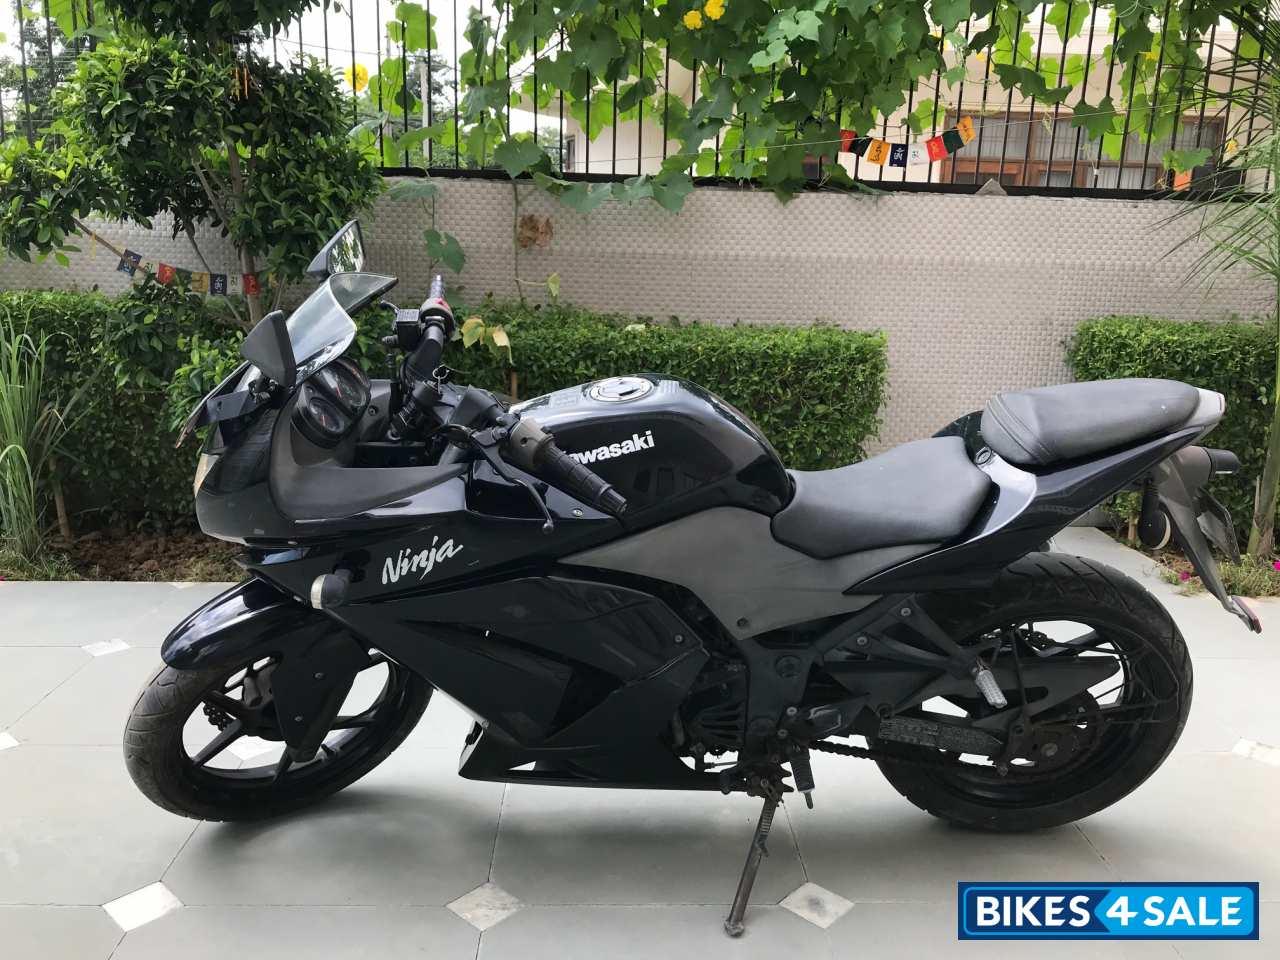 Used 2009 Model Kawasaki Ninja 250r For Sale In Faridabad Id 280529 Black Colour Bikes4sale